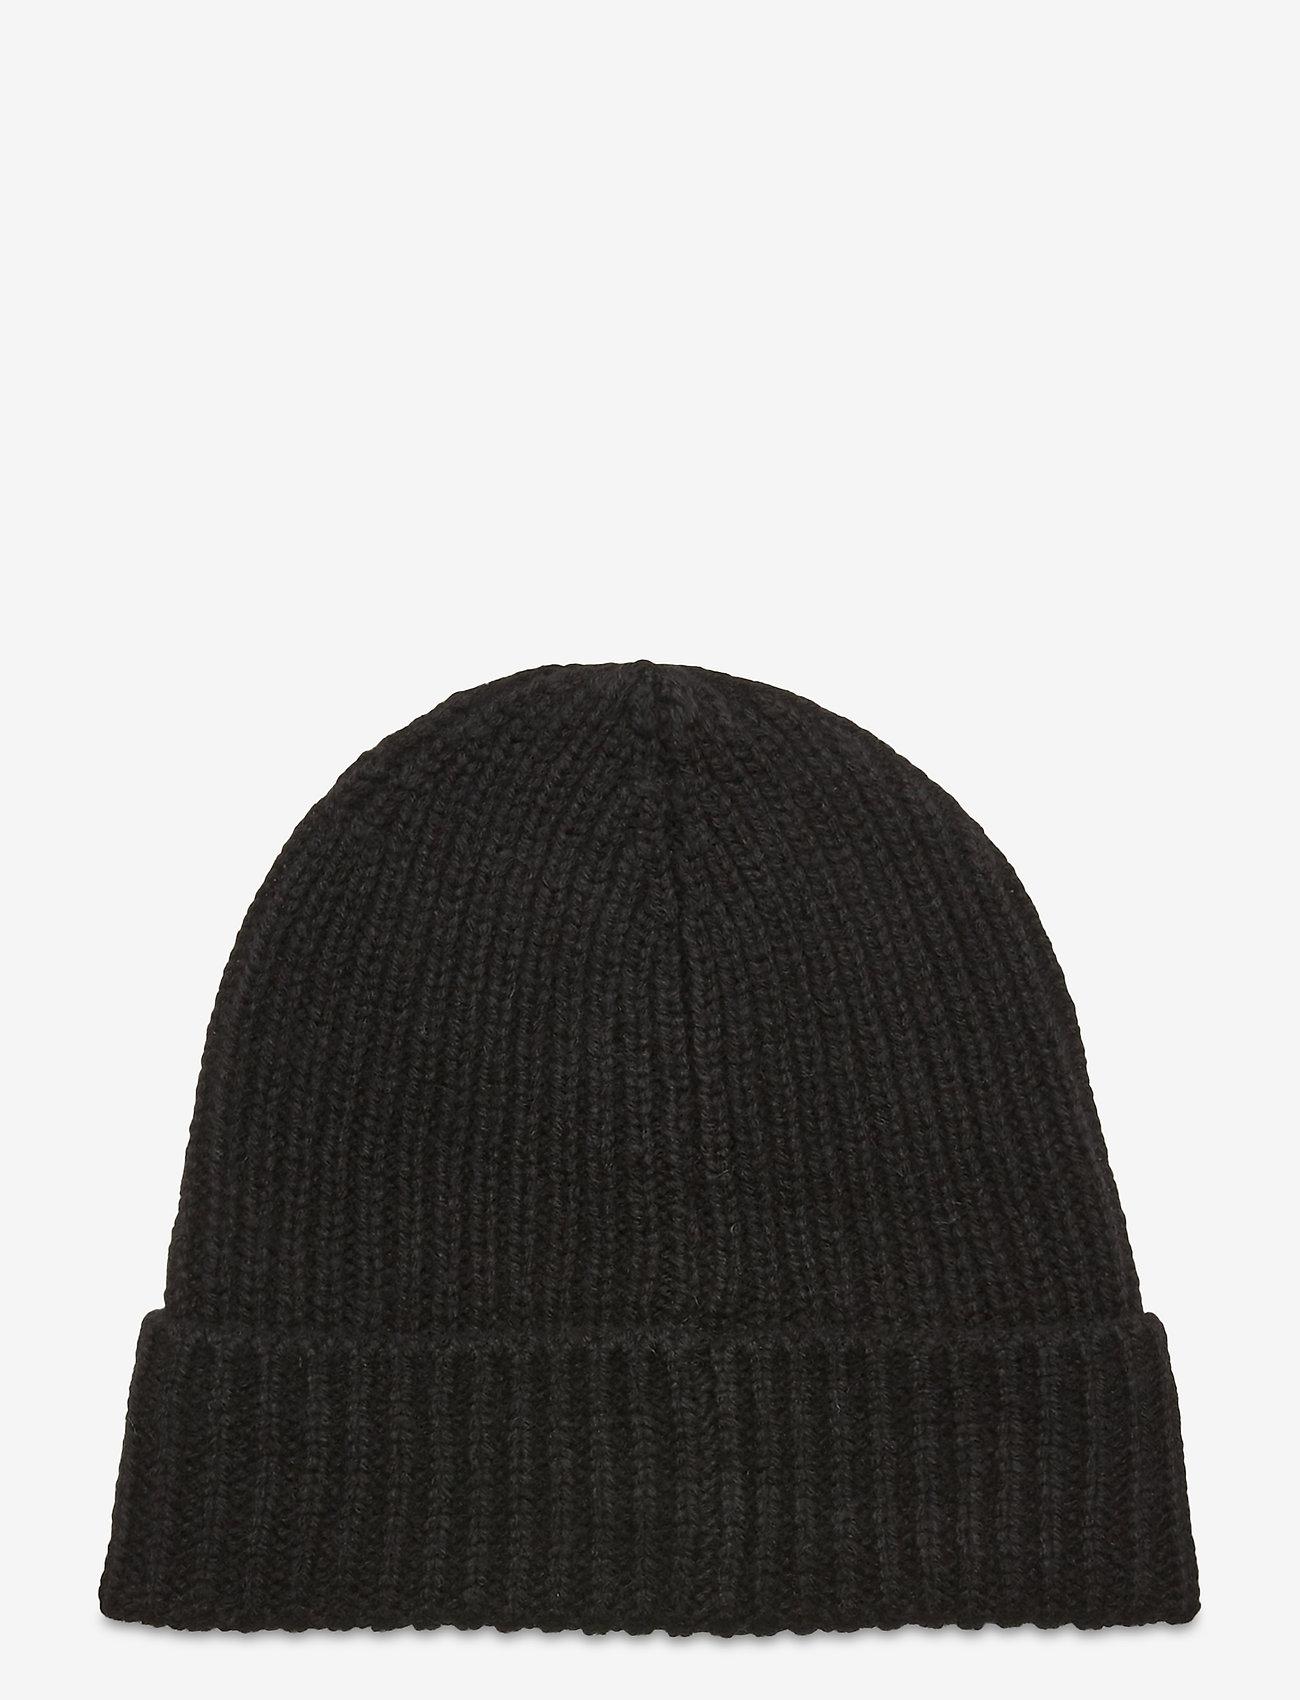 Mys Hat Black (Black) (50 €) - Peak Performance ElHKJ